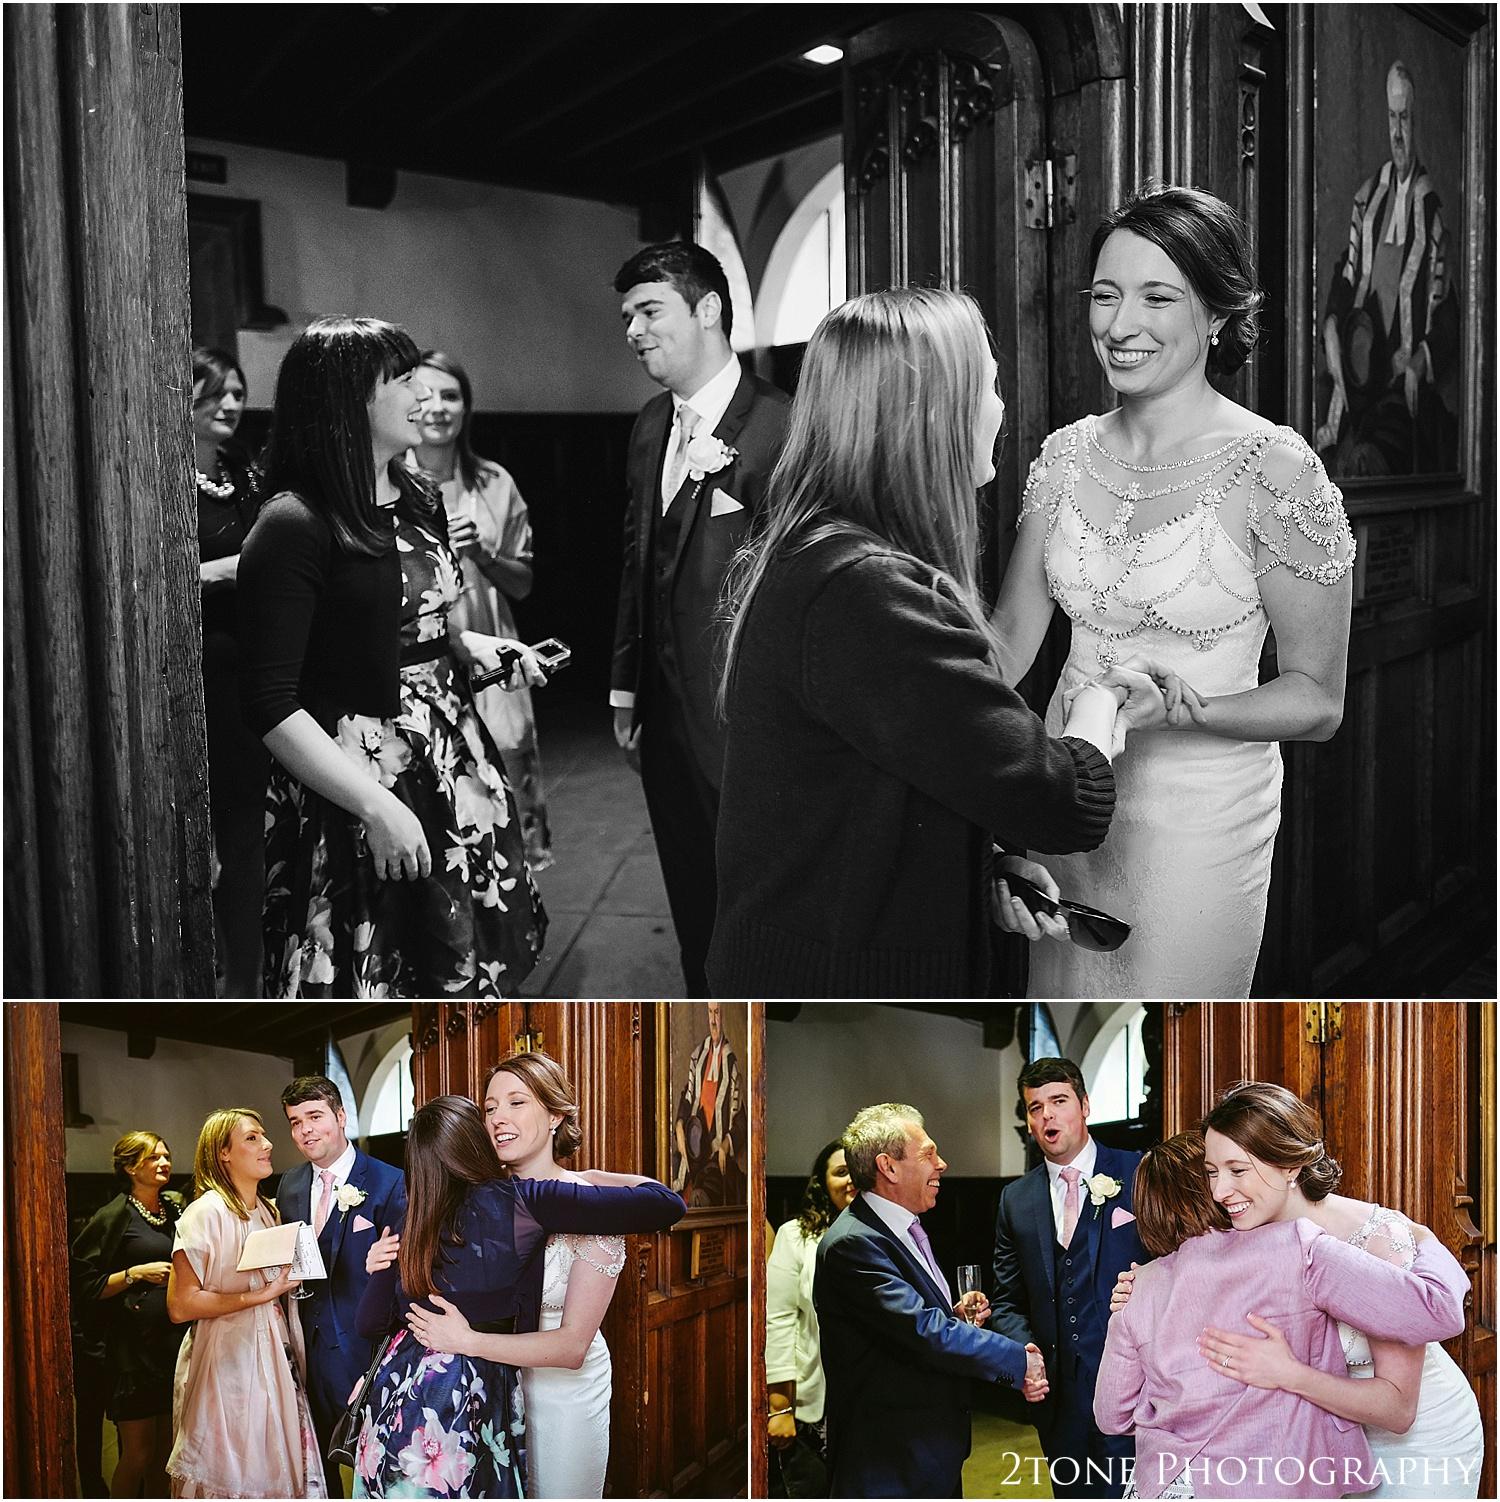 Durham-Castle-wedding-Laura-James 074.jpg